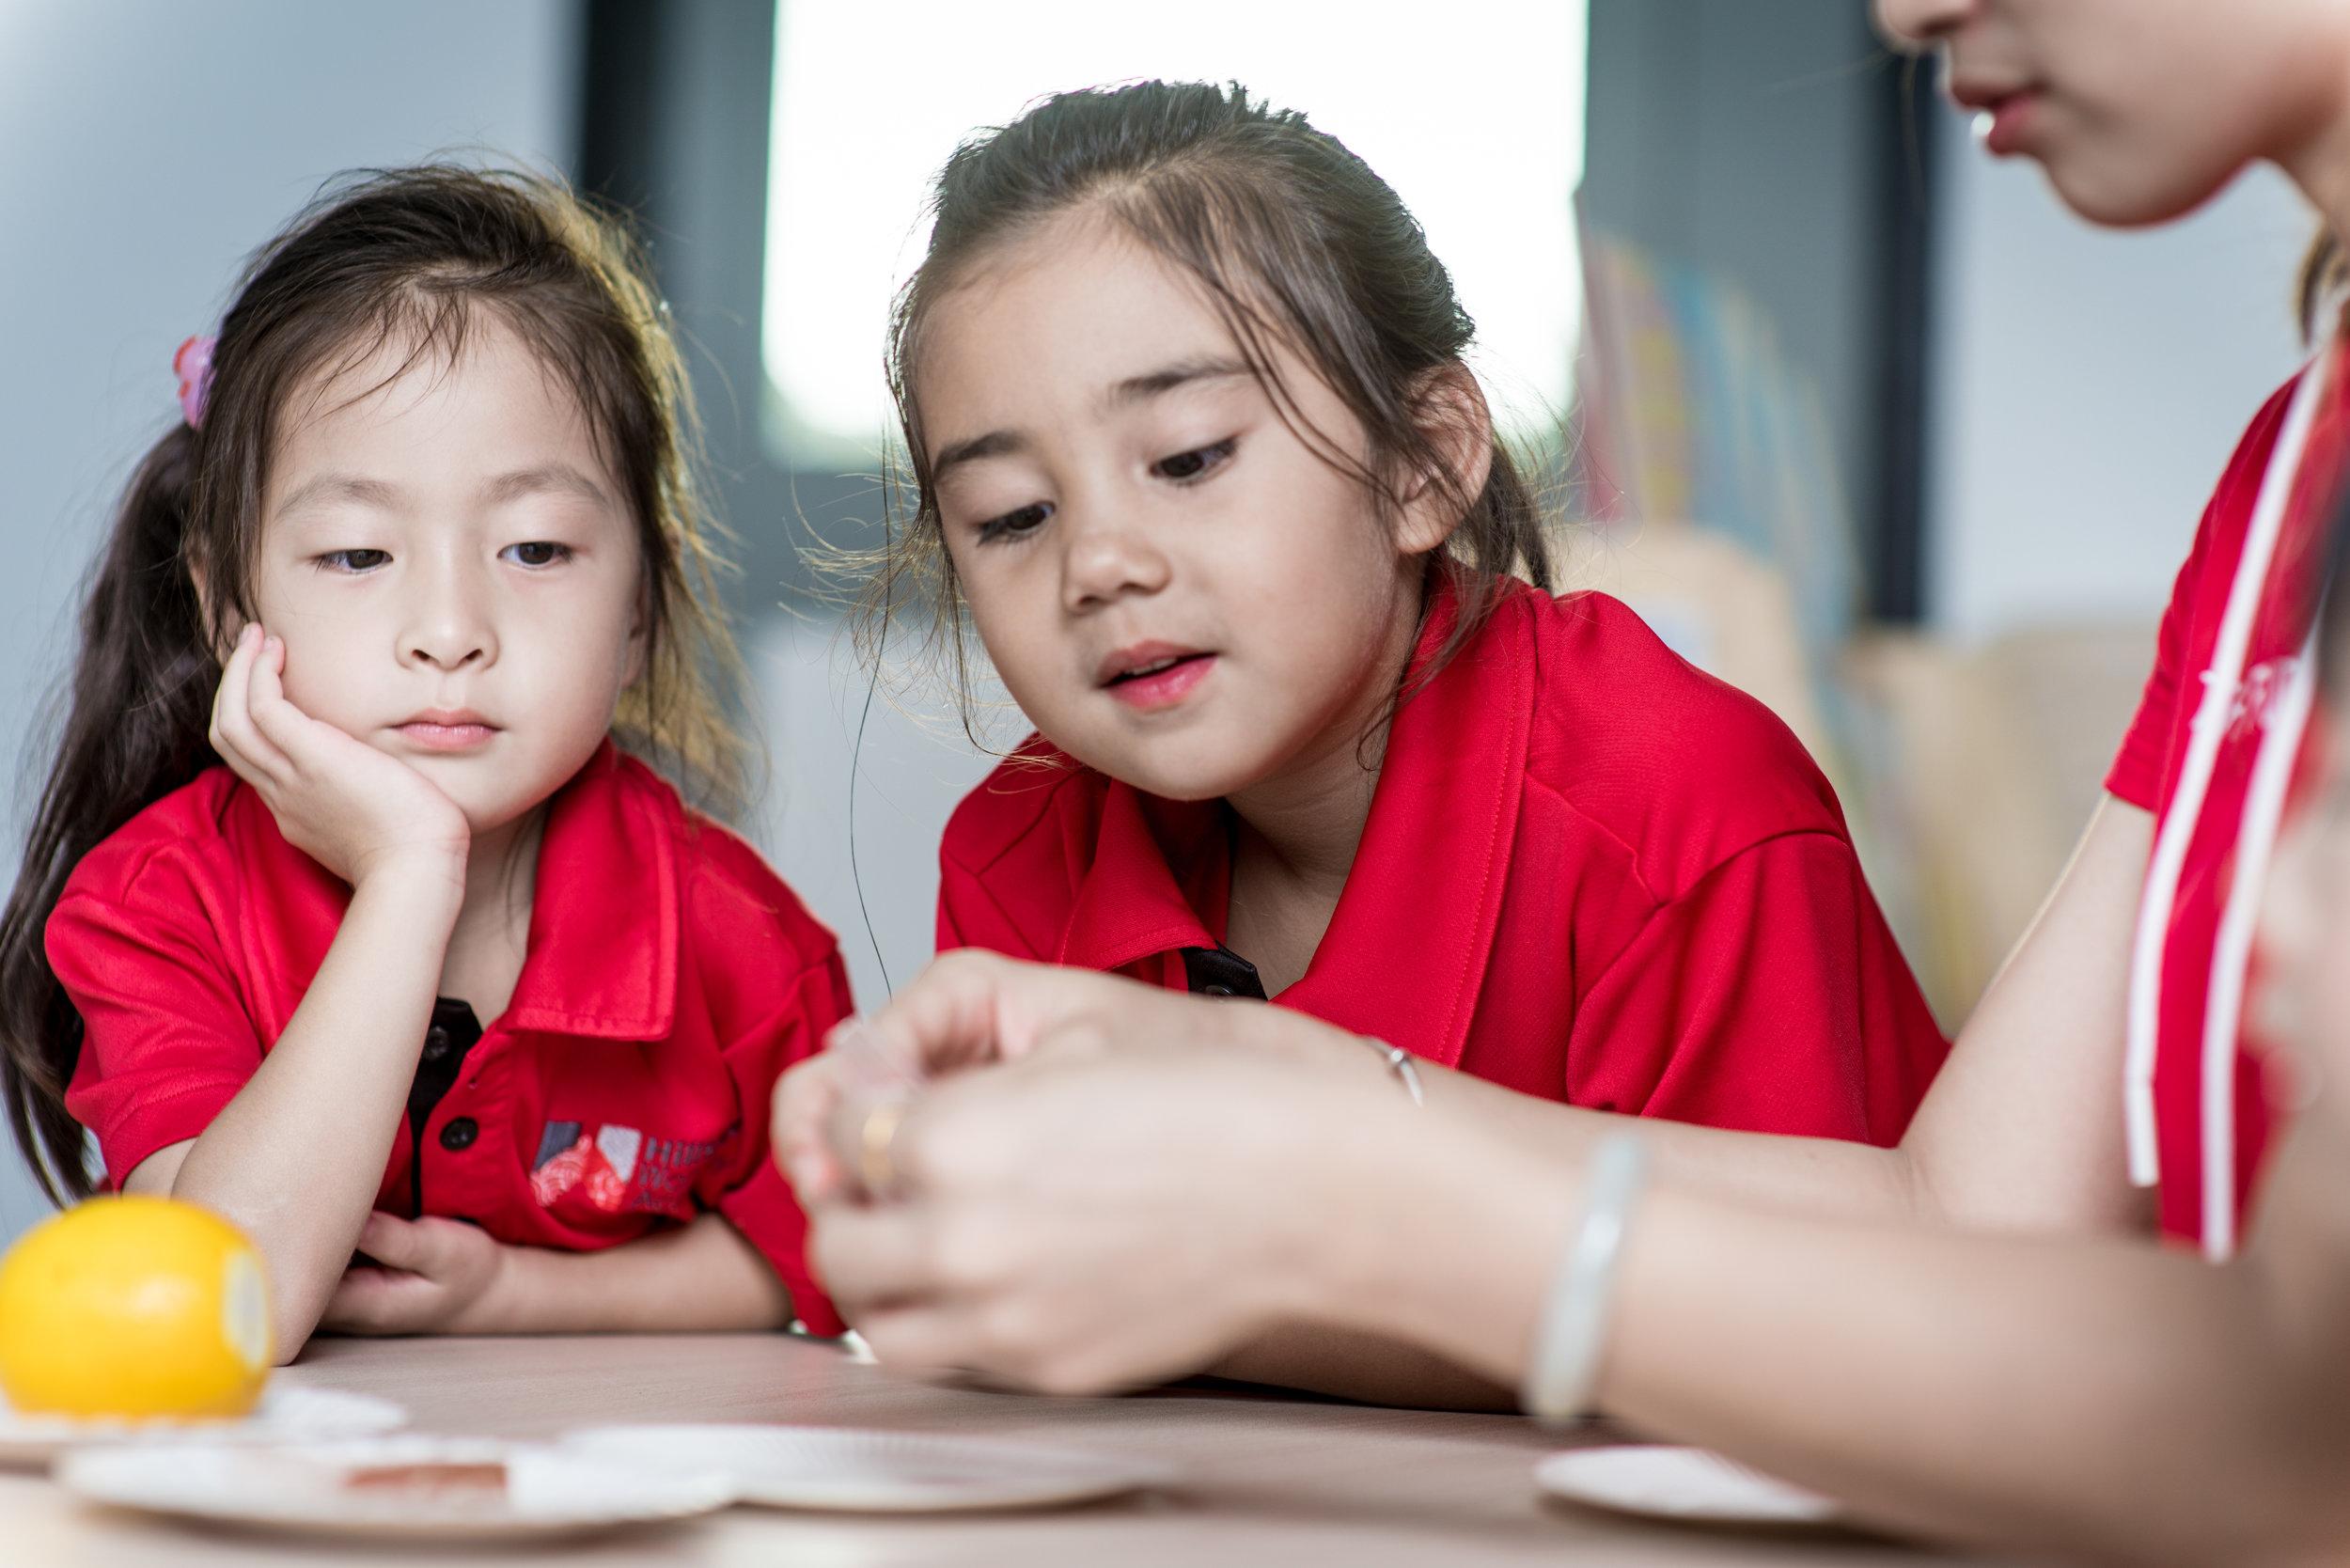 KINDERGARTEN - Nurturing caring and thinking future global leaders